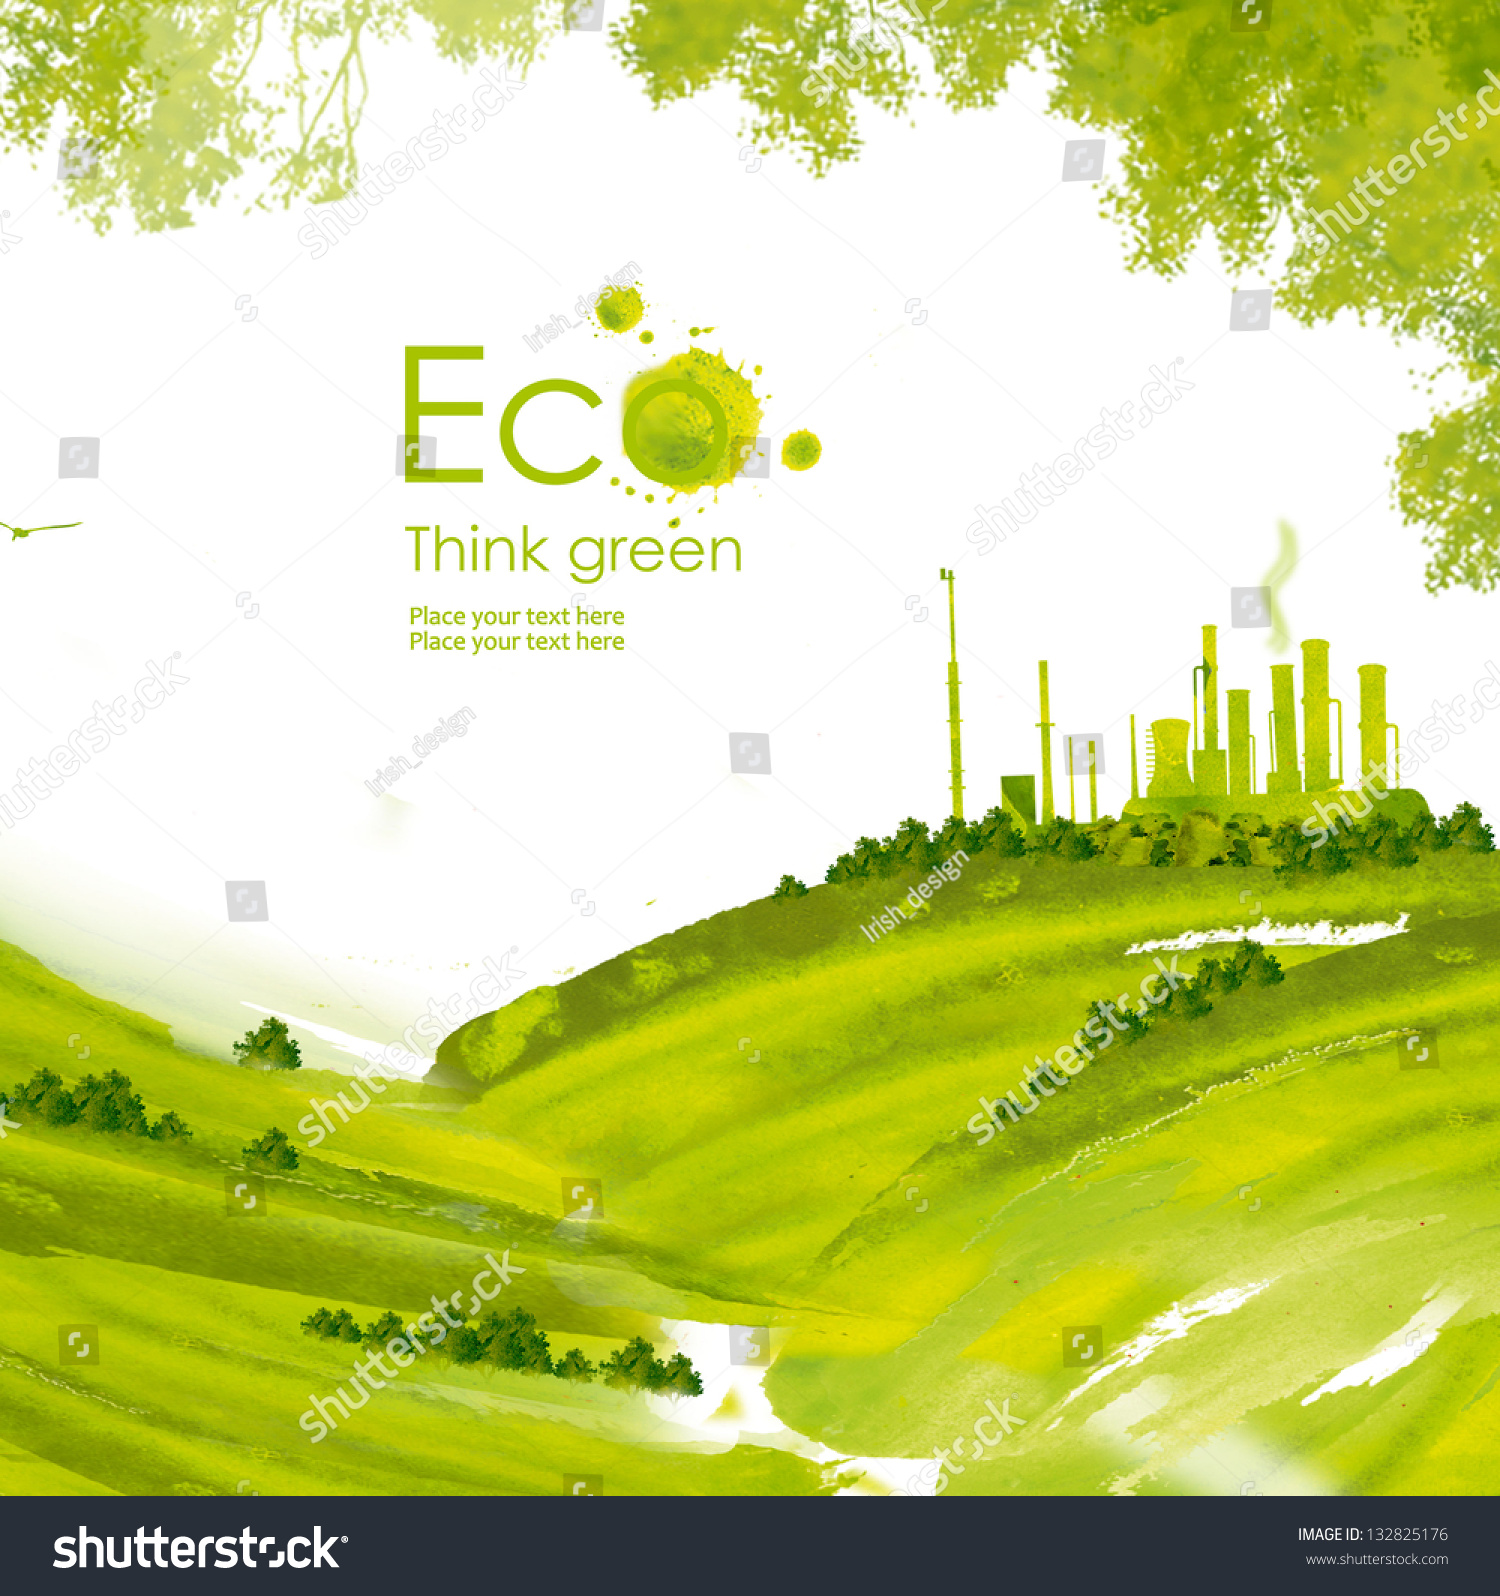 Environmental Concept Earthfriendly Landscapes: Illustration Environmentally Friendly Planetgreen Factory